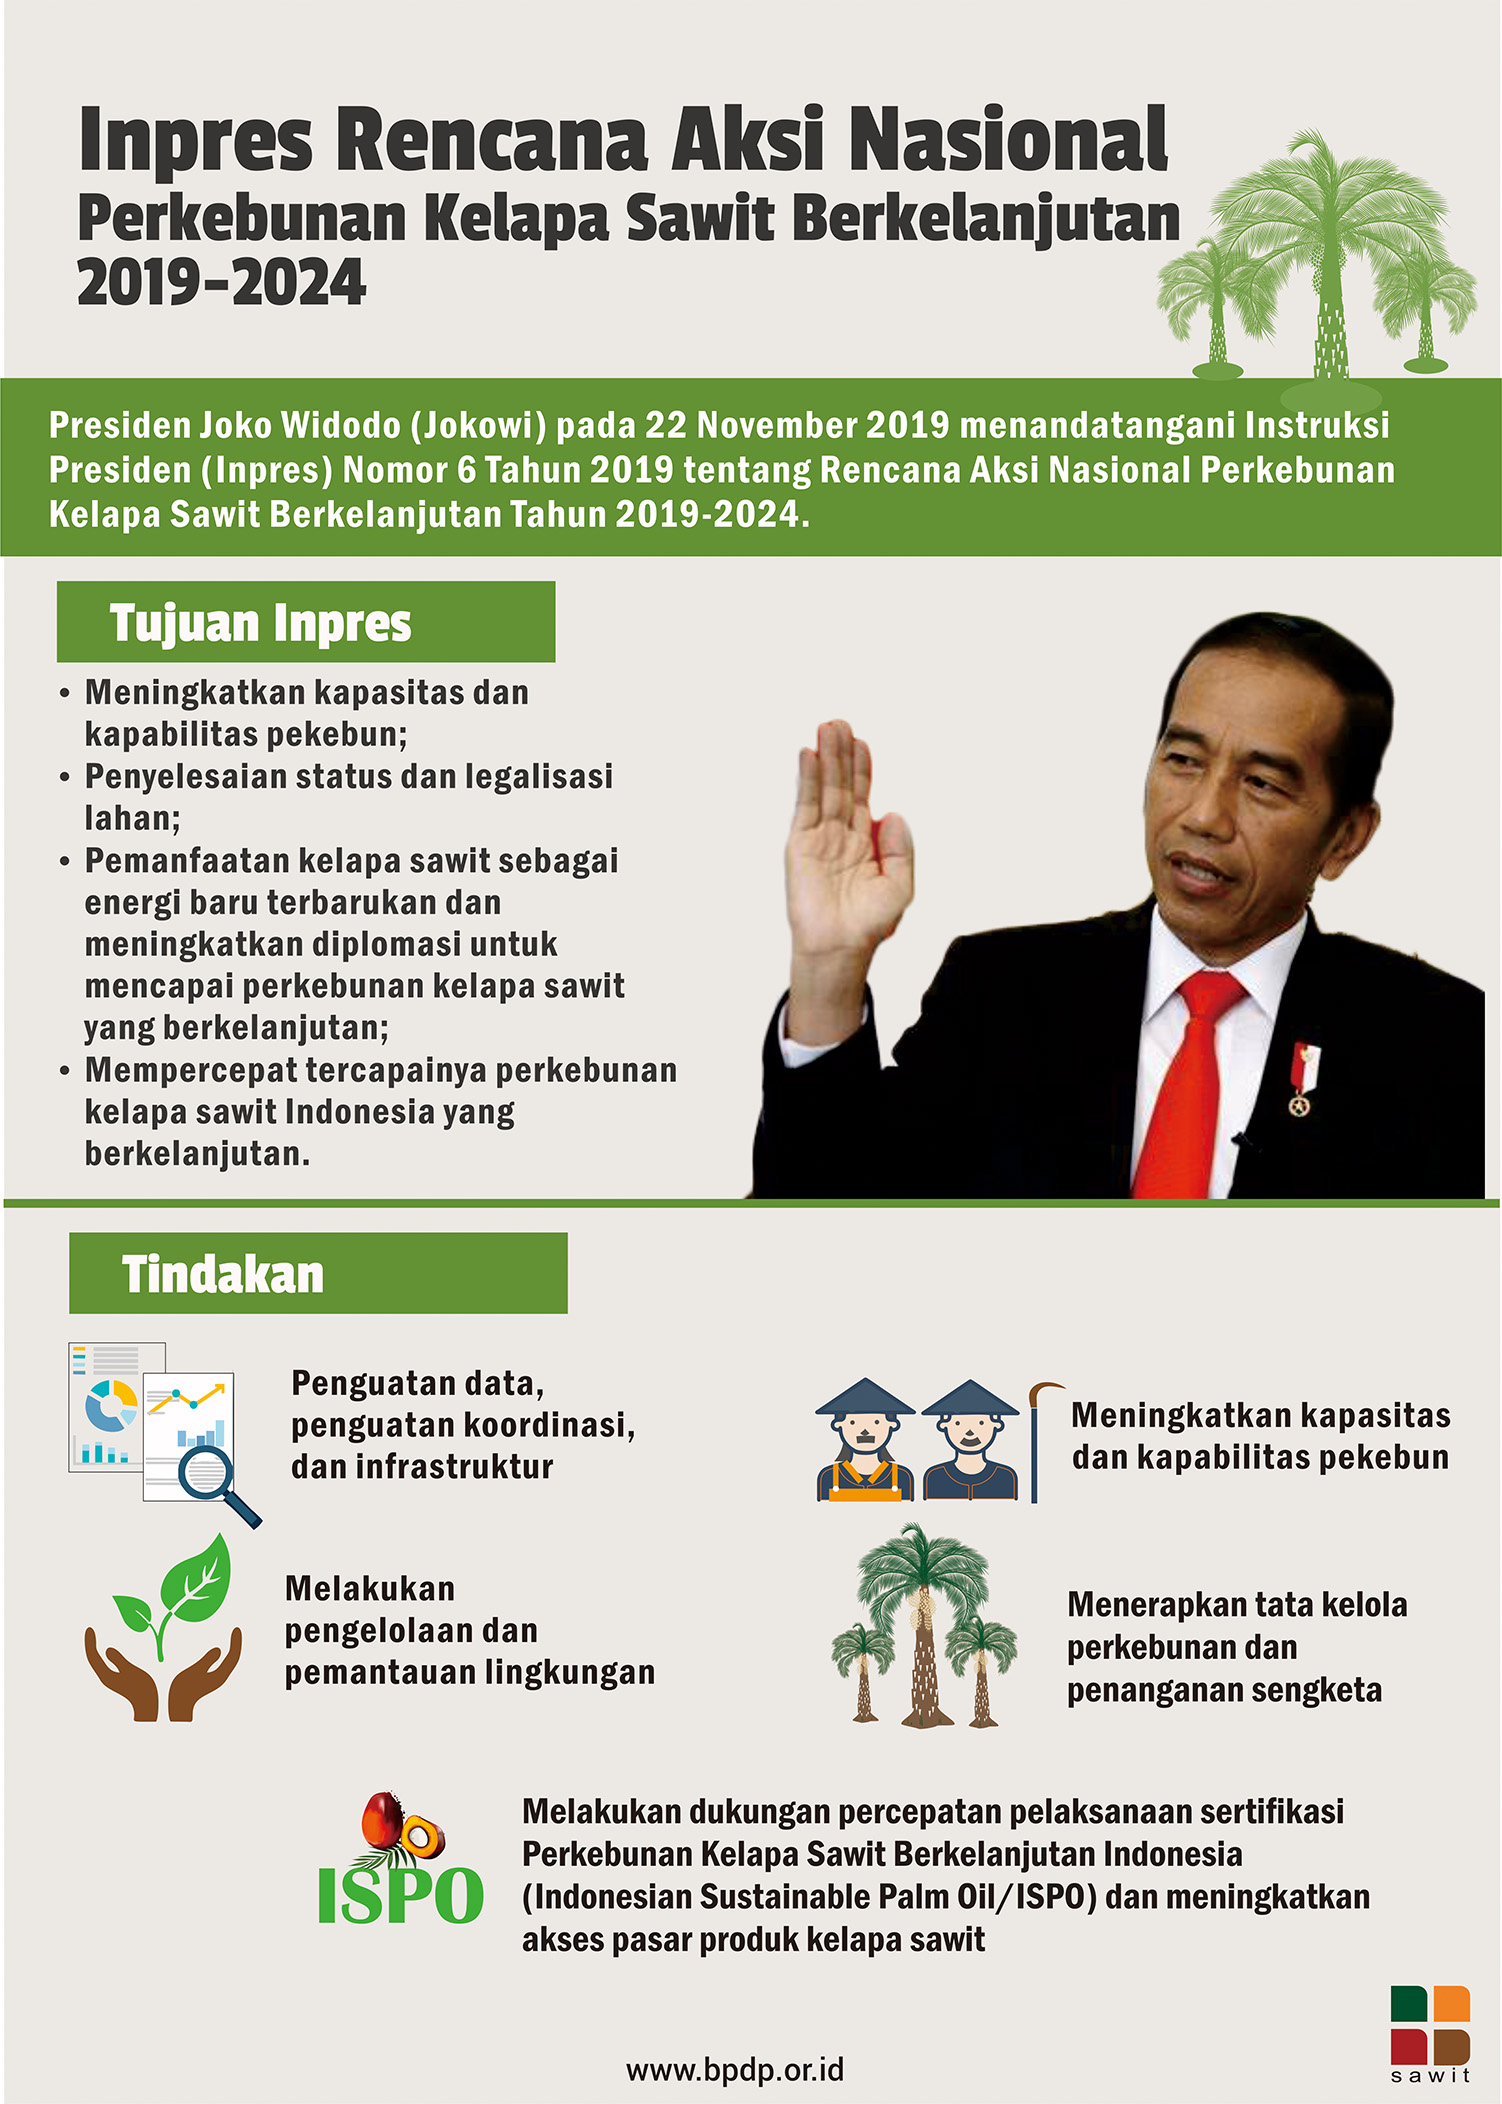 Inpres Rencana Aksi Nasional Sawit Berkelanjutan 2019-2024